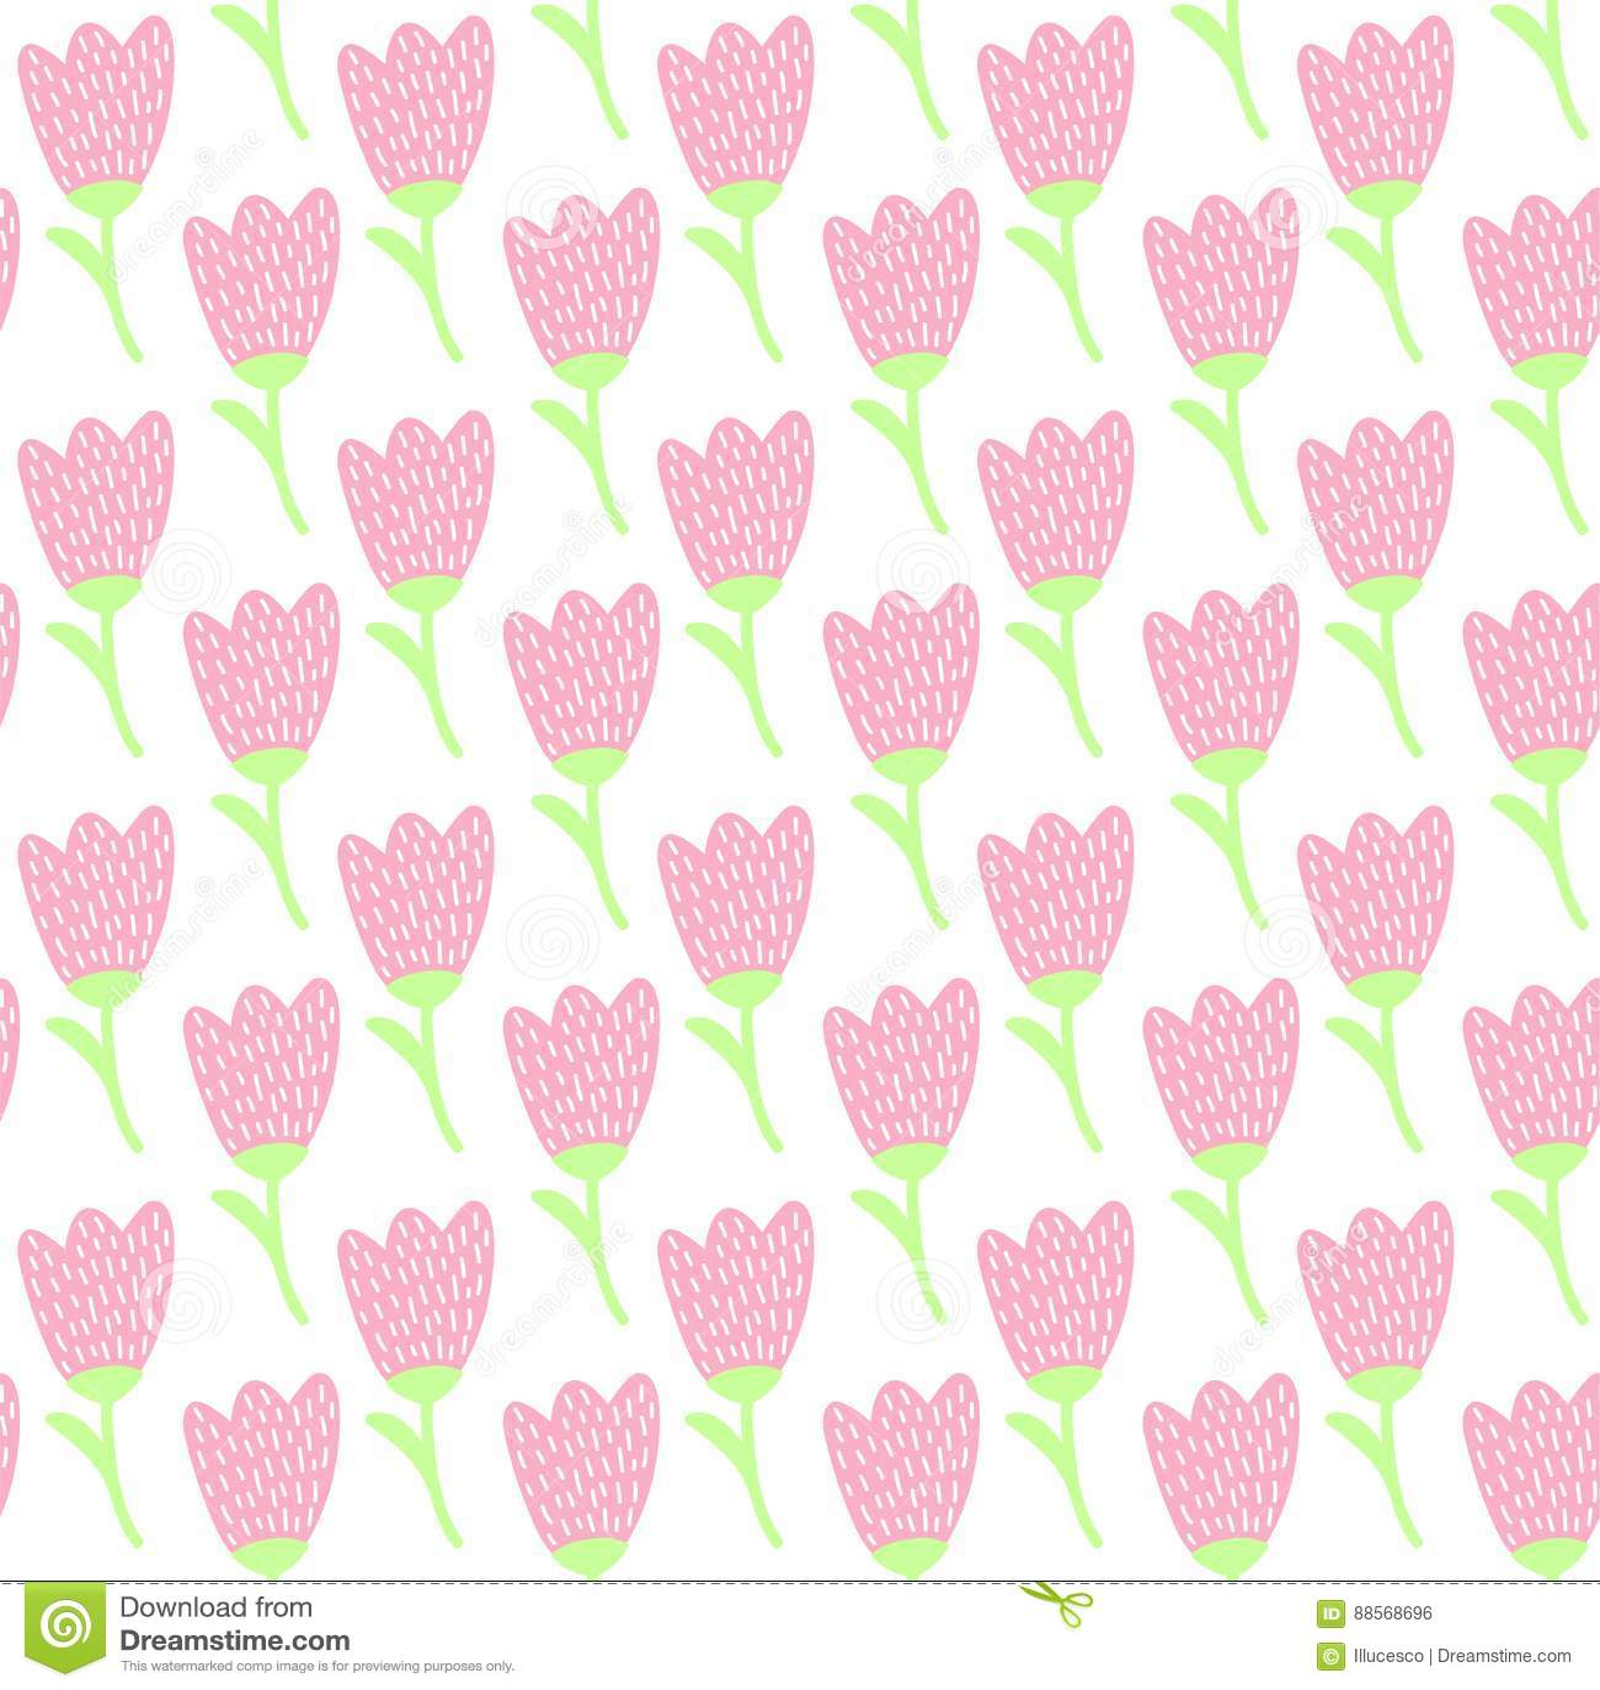 Simple Doodle Pink Tulip Pattern Cute Pastel Flower Seamless Background Summer Wallpaper